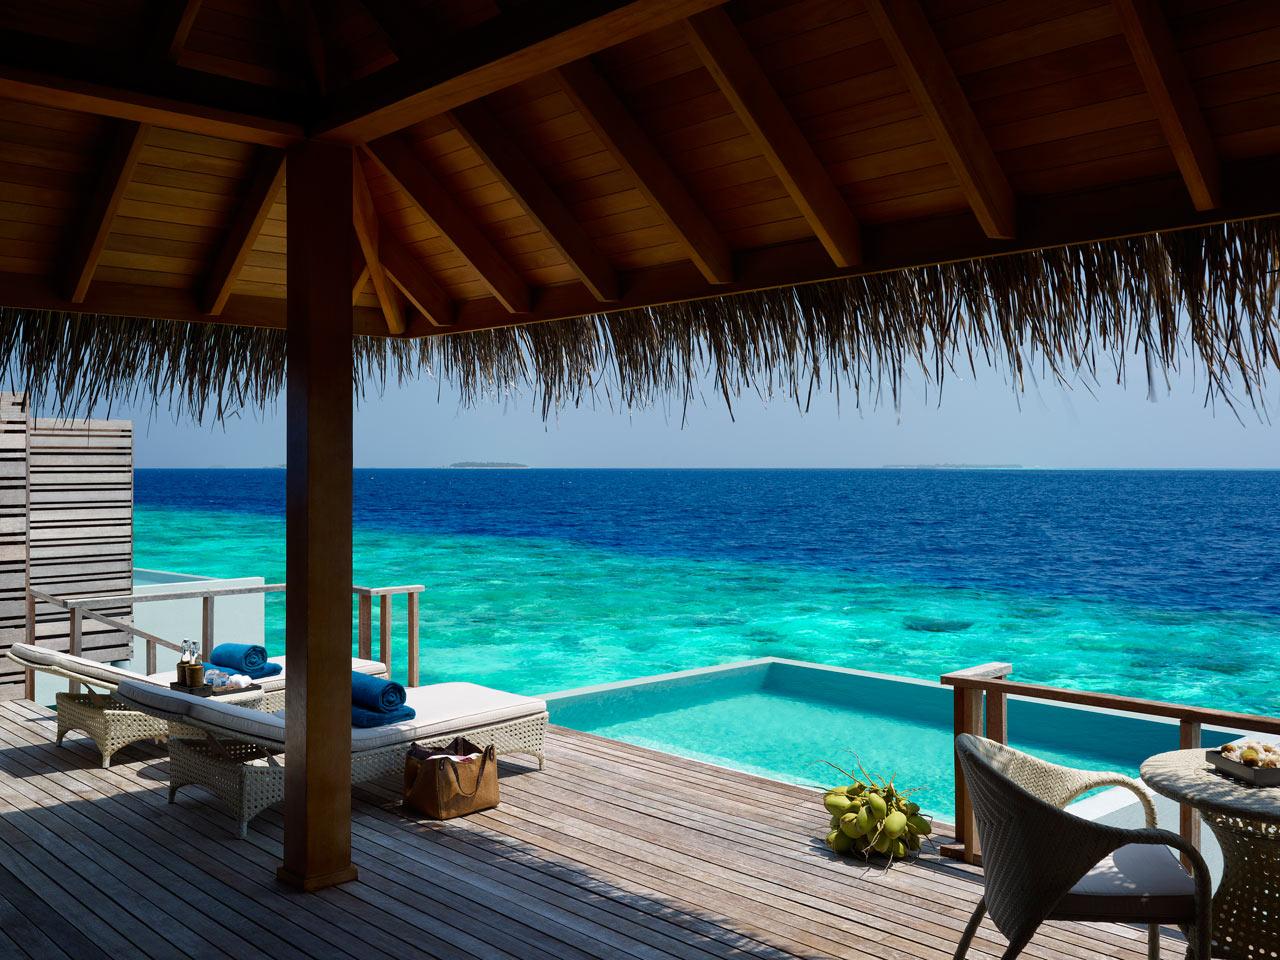 Dusit-Thani-Maldives-Hotel-Resort-7